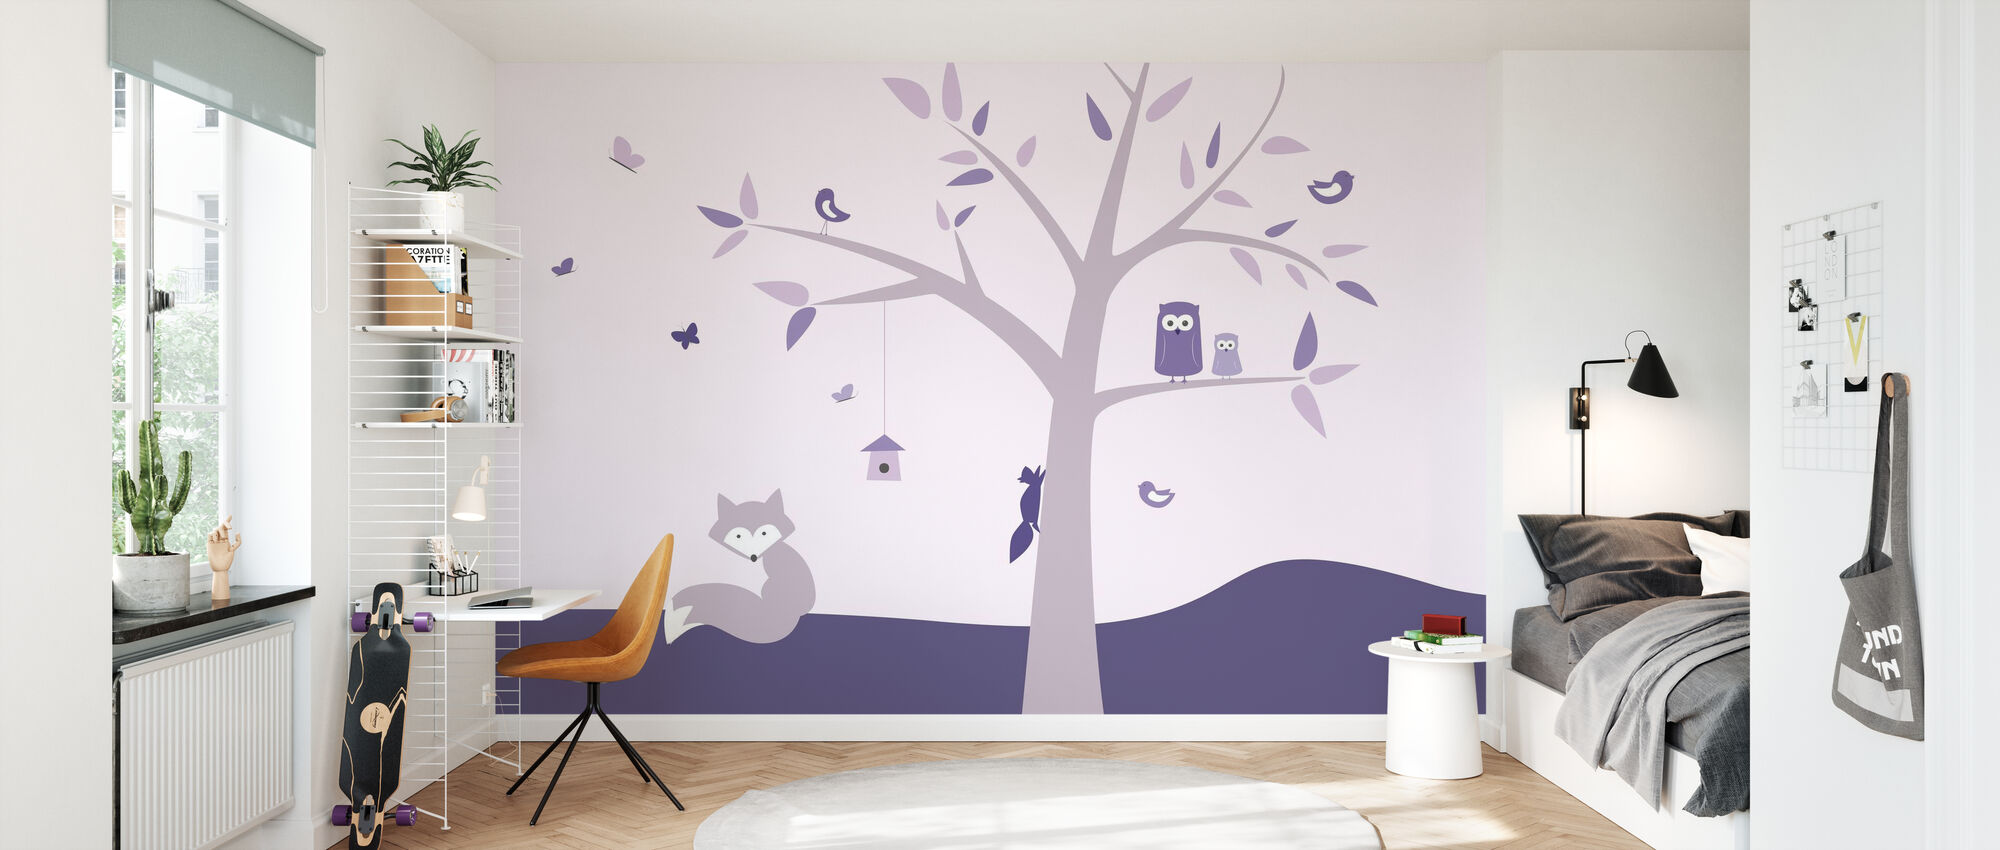 Eläinpuu - Violetti - Tapetti - Lastenhuone